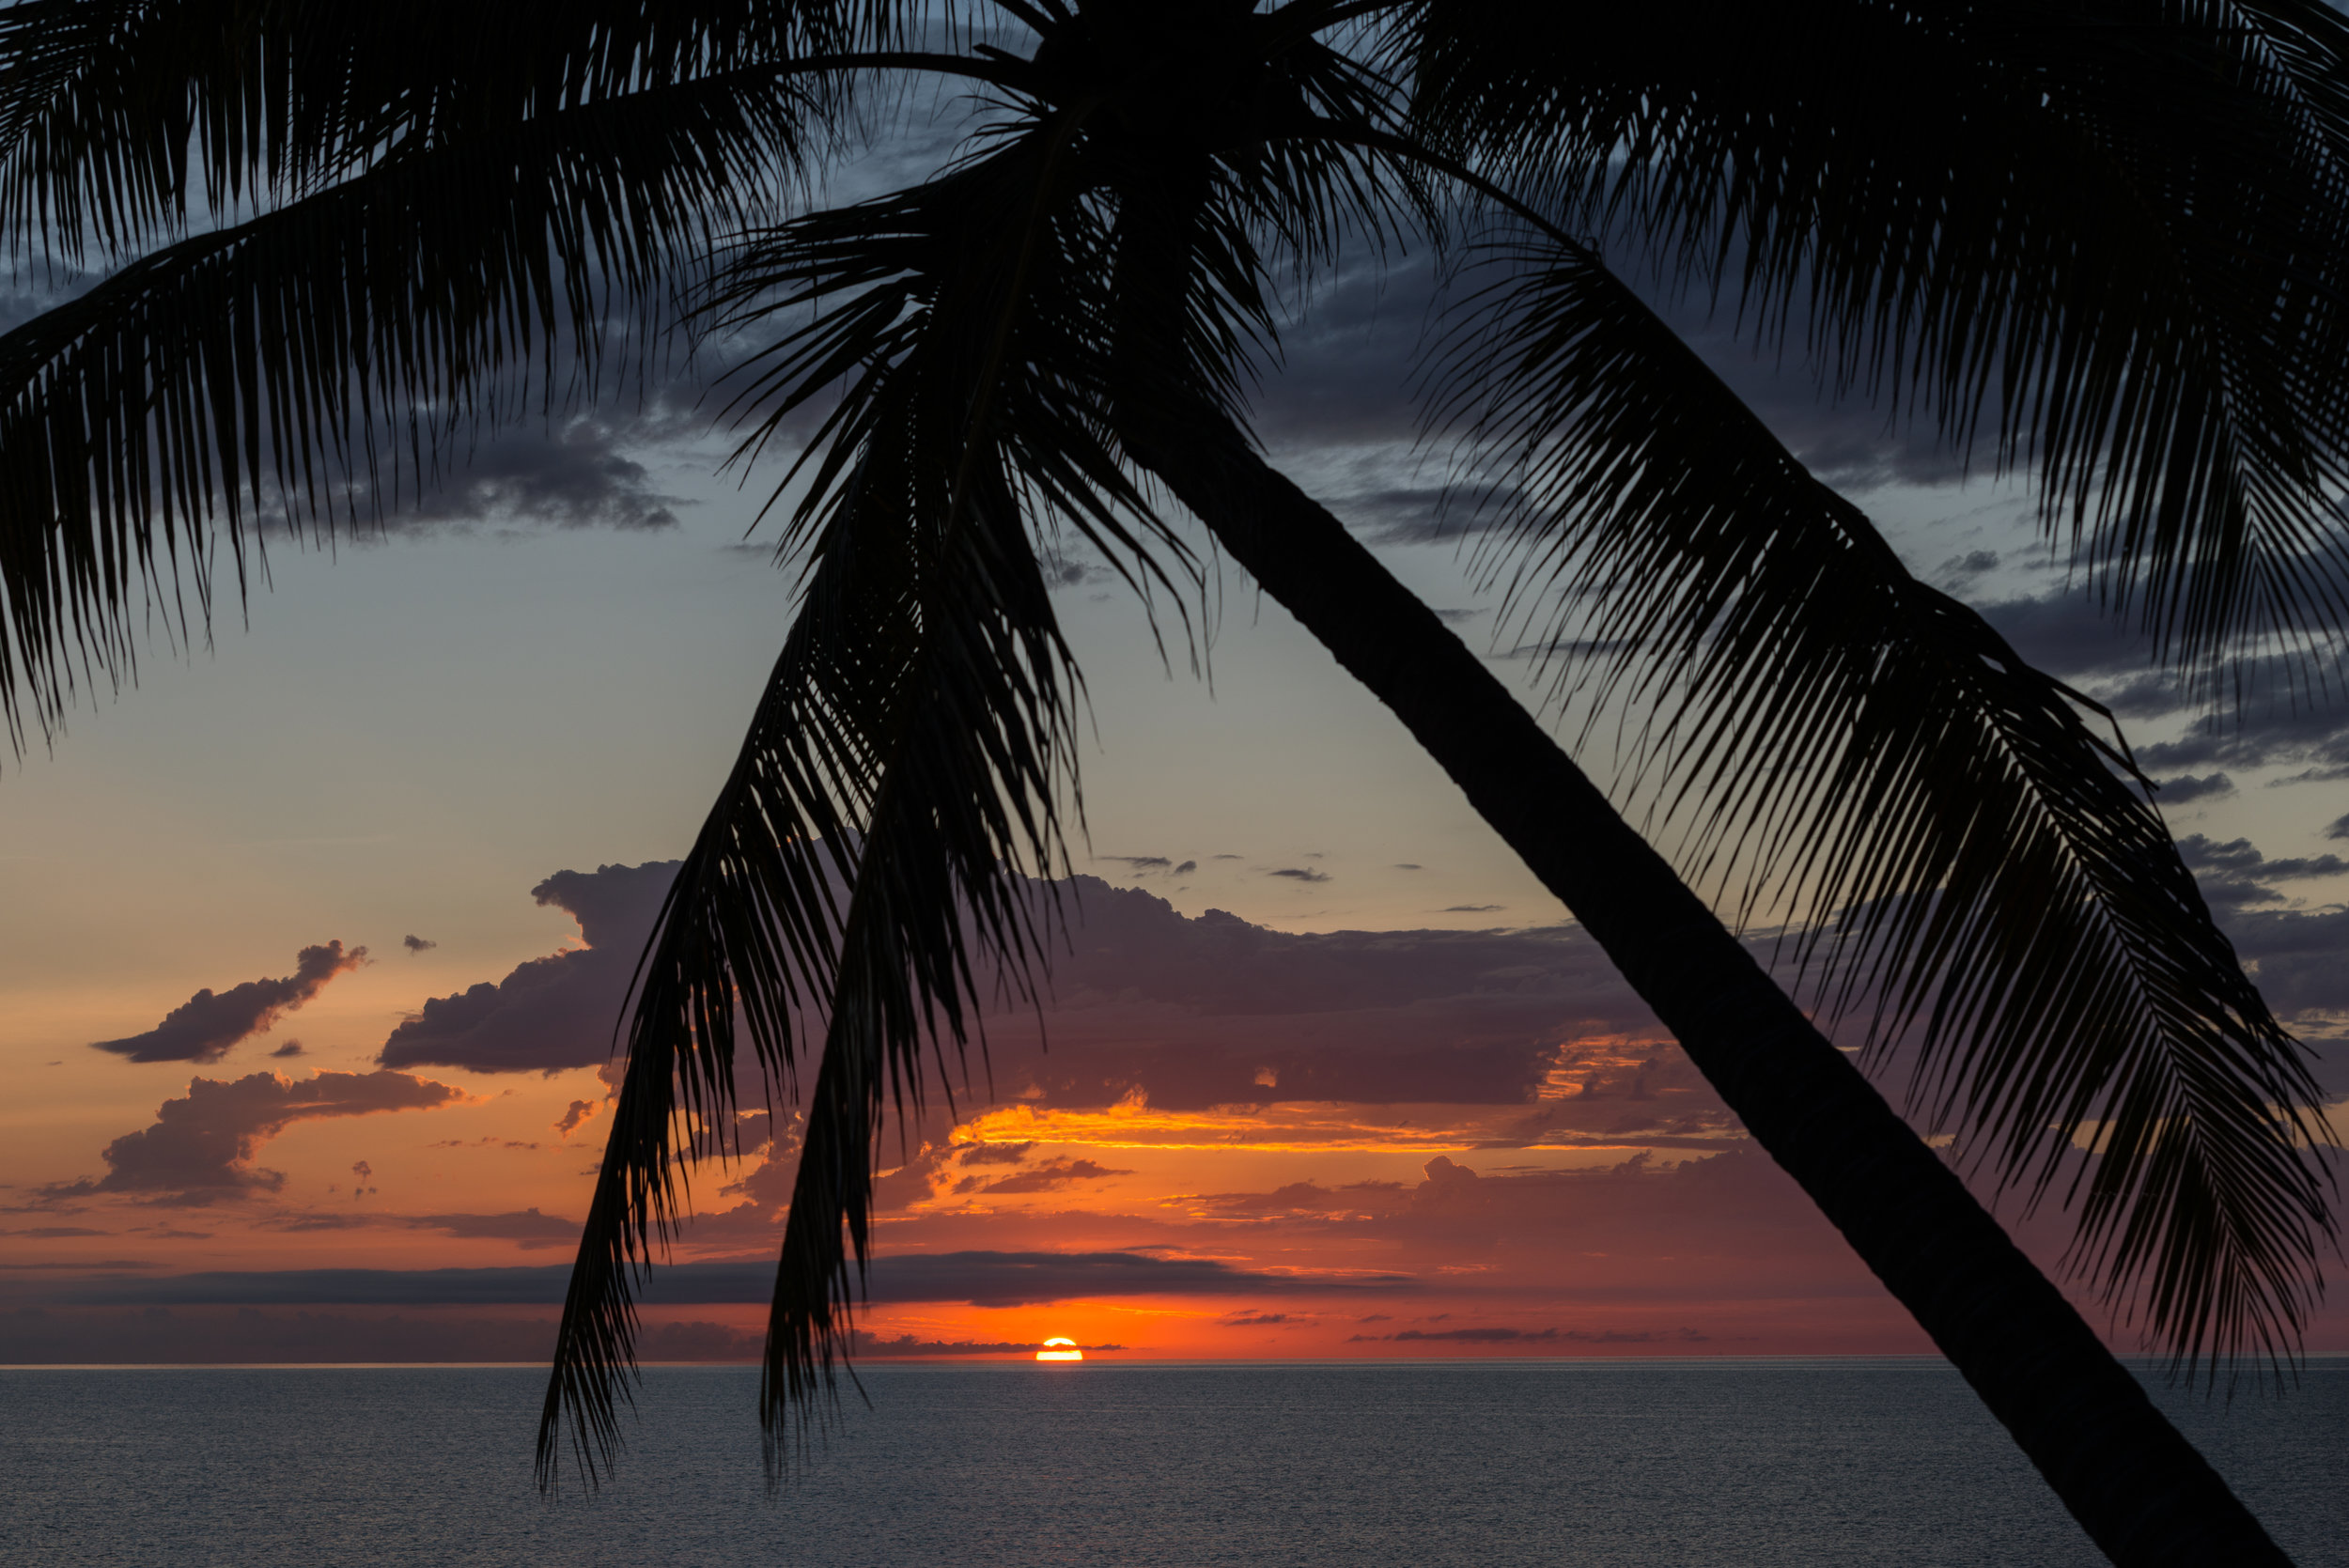 Thala_Beach_Nature_Reserve_2016__51.jpg